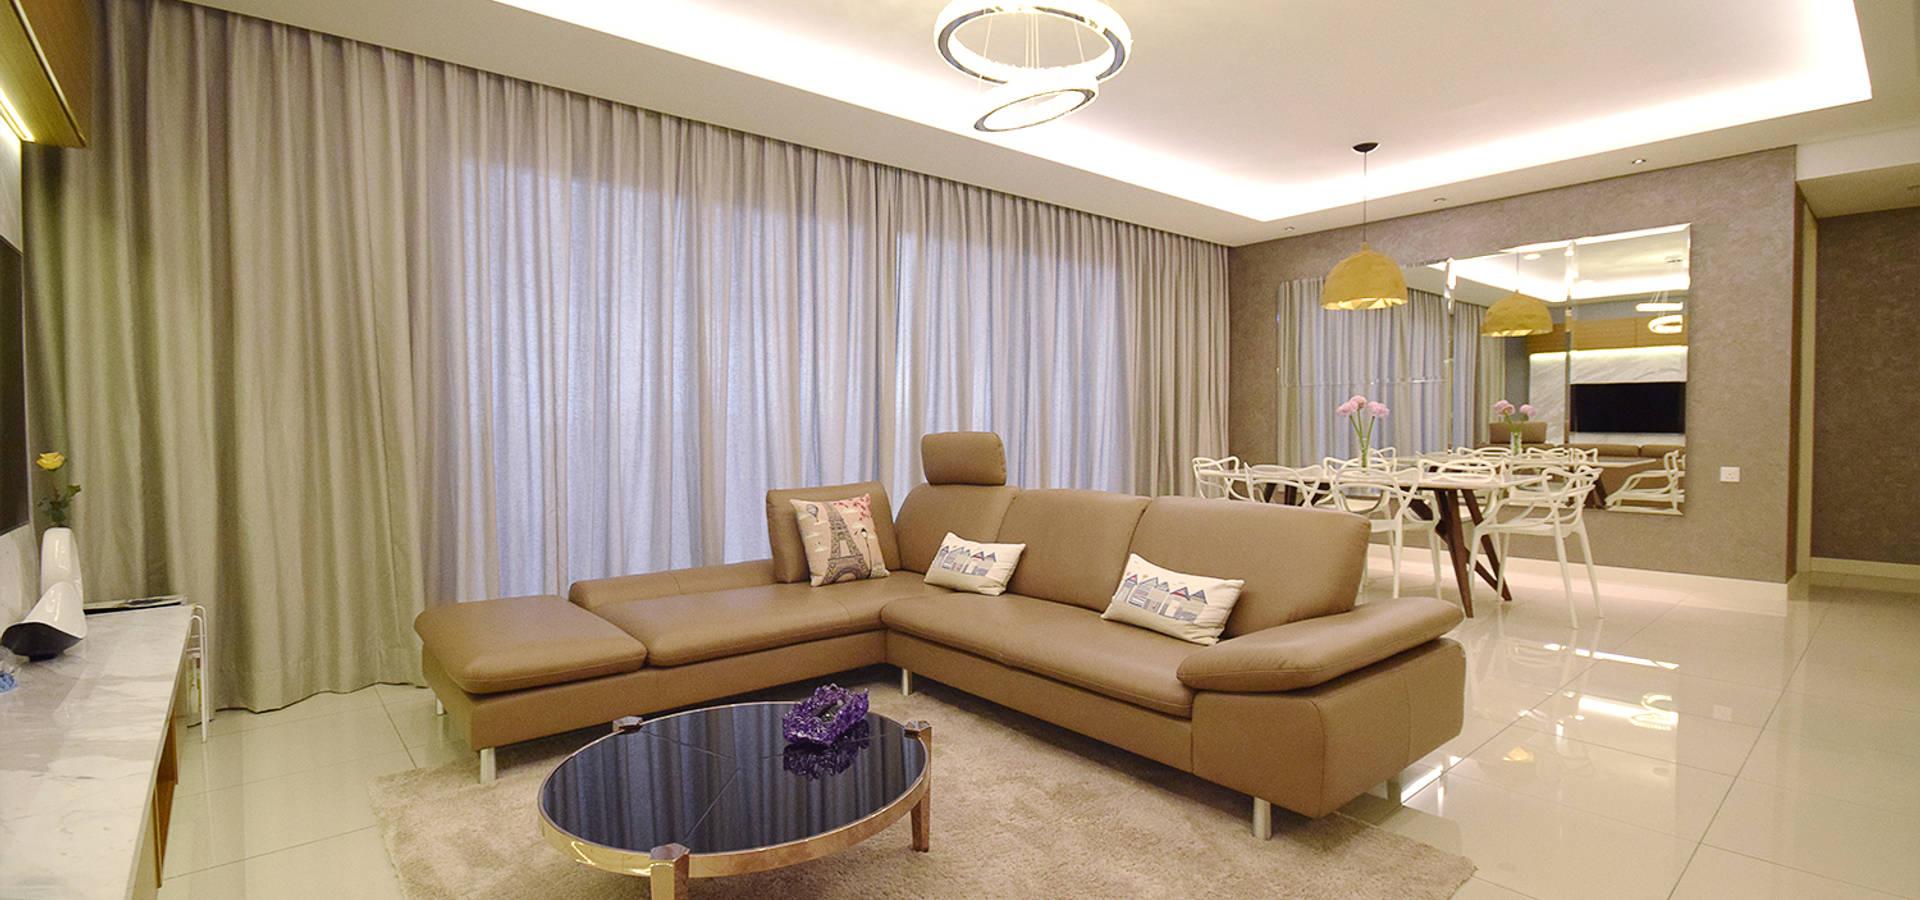 Hatch Interior Studio Sdn Bhd